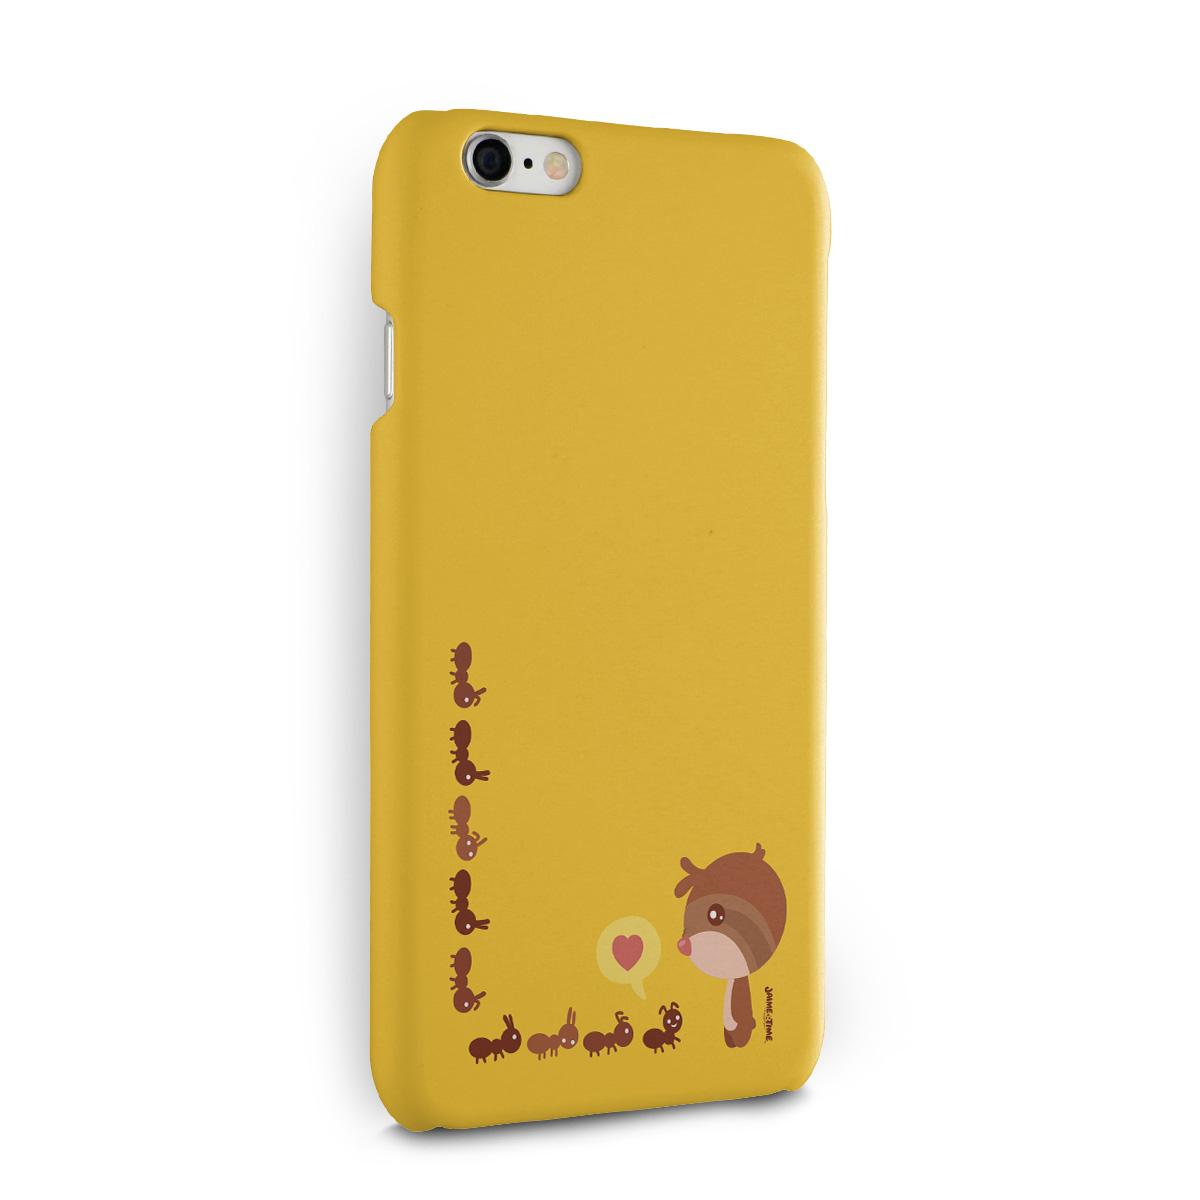 Capa para iPhone 6/6S Jaime Formigas